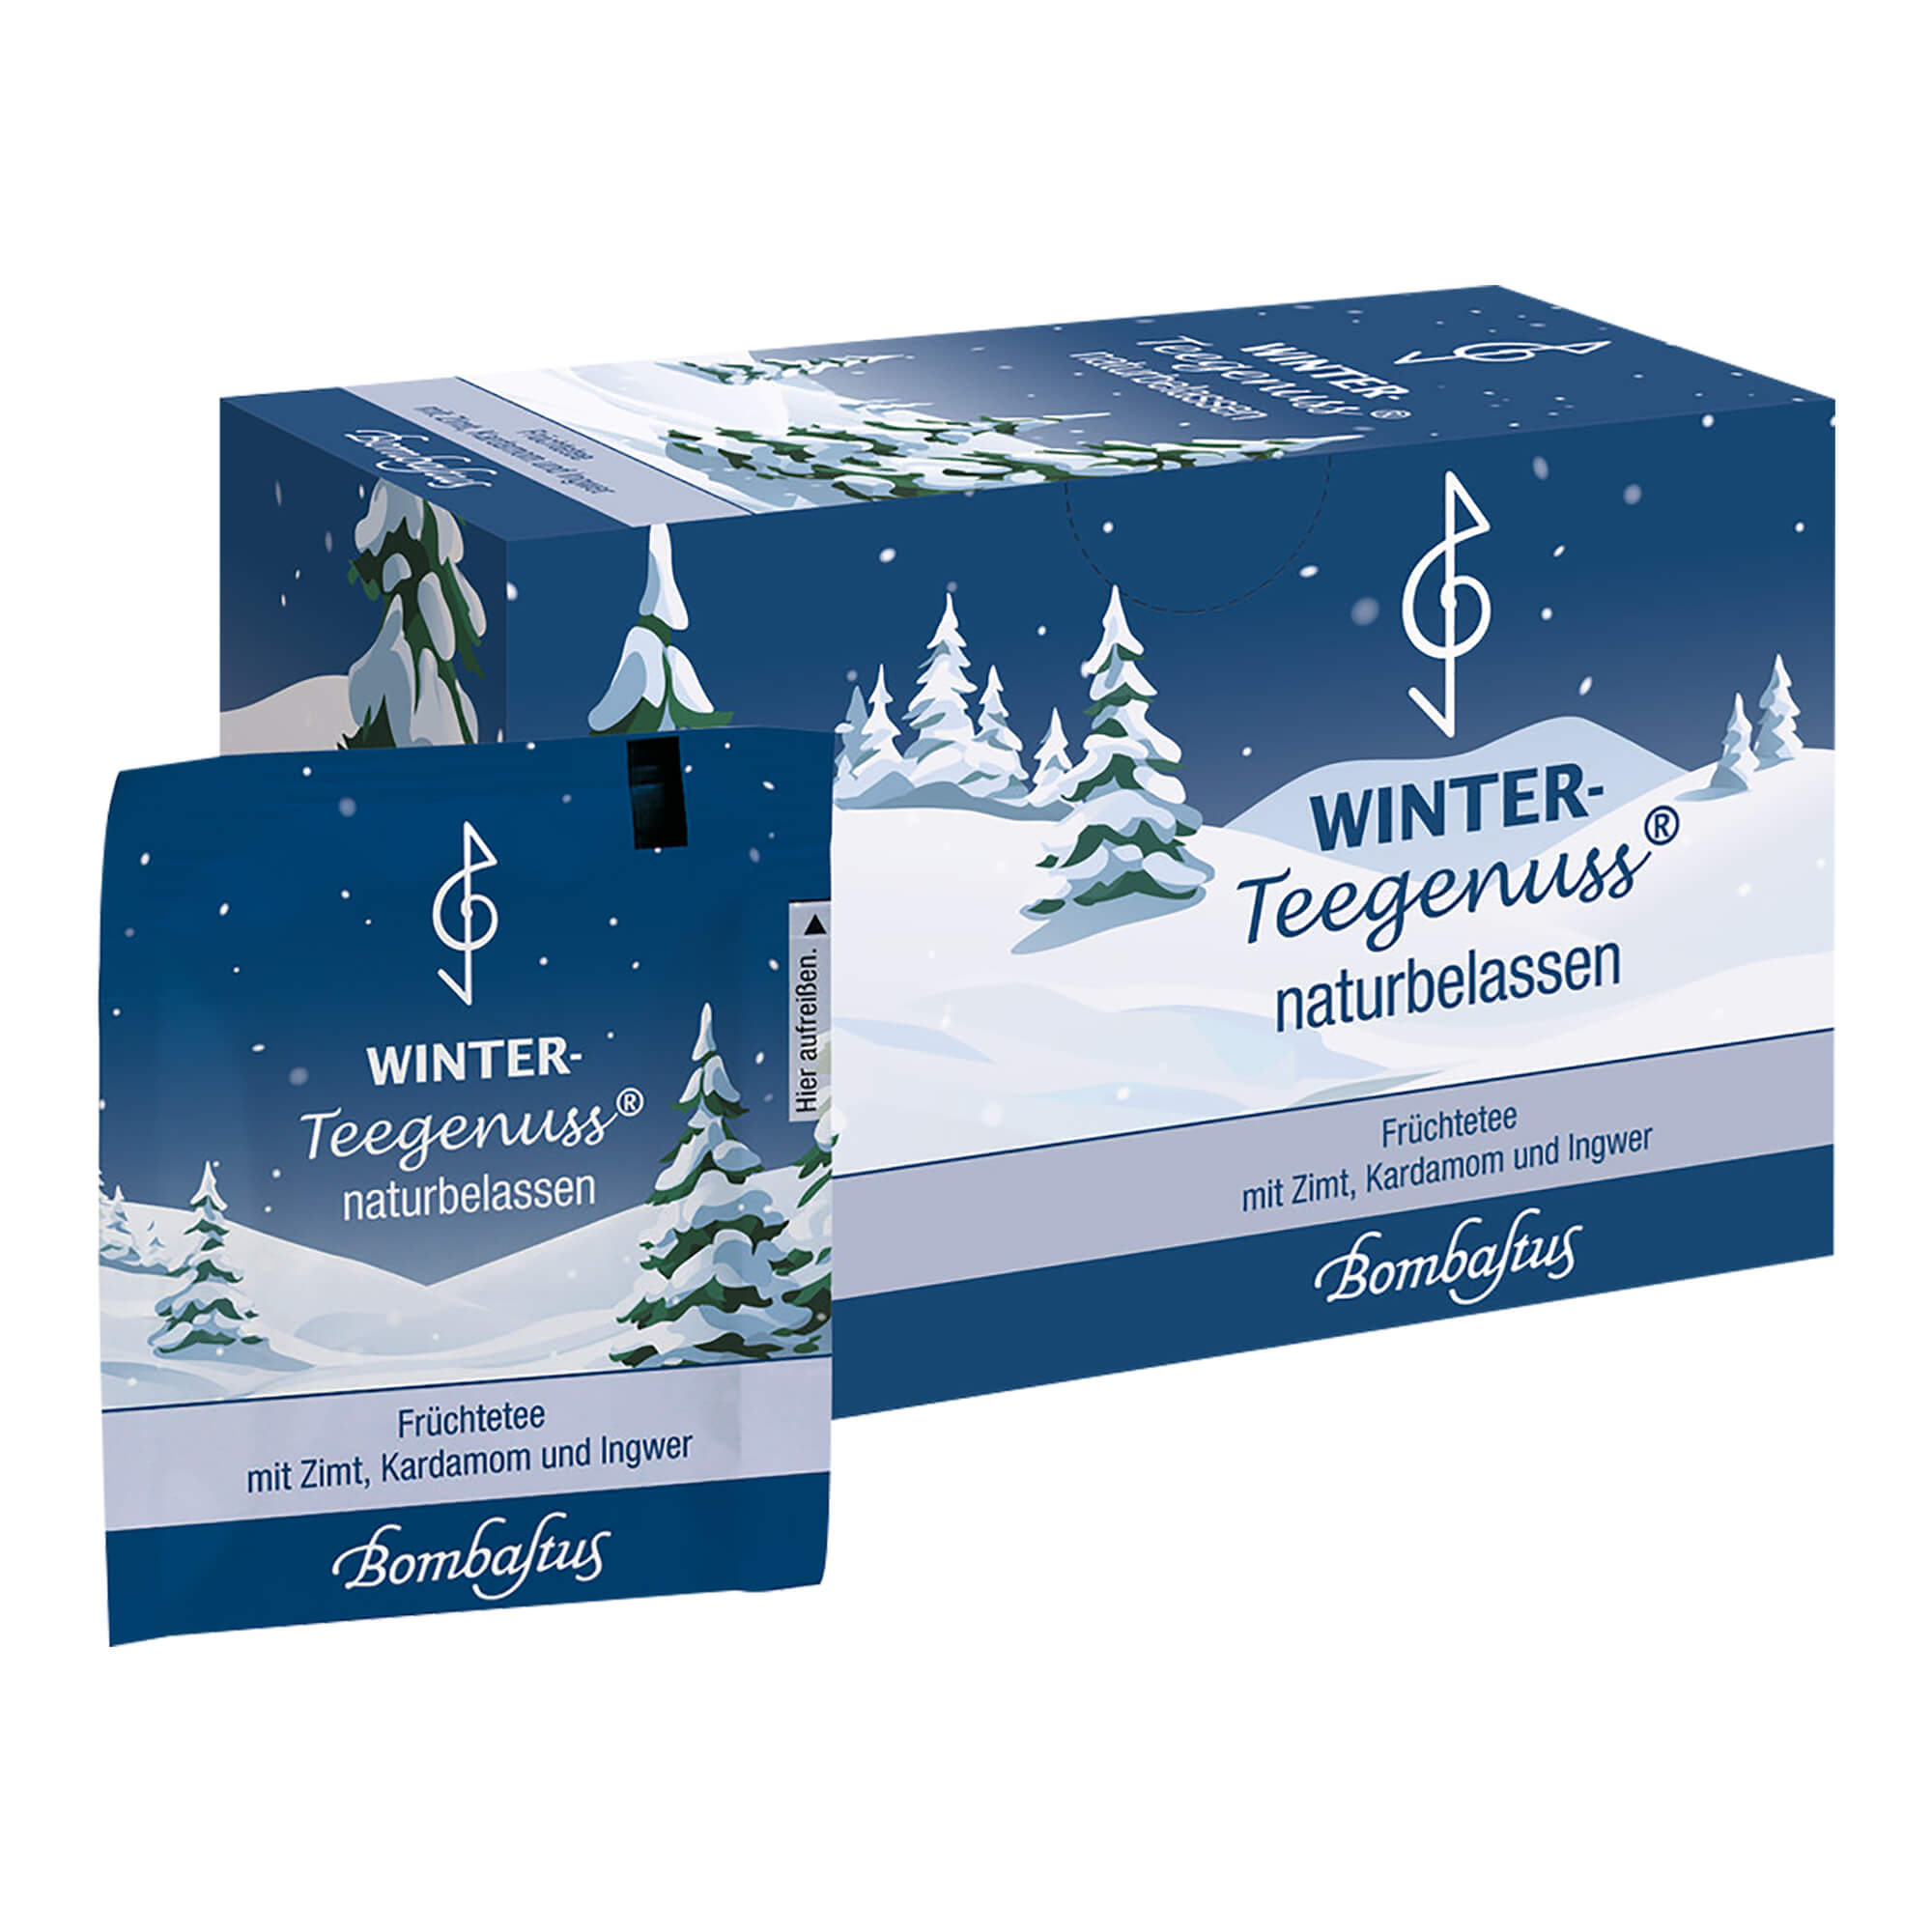 Winter-Teegenuss Zimt Kardamom Ingwer